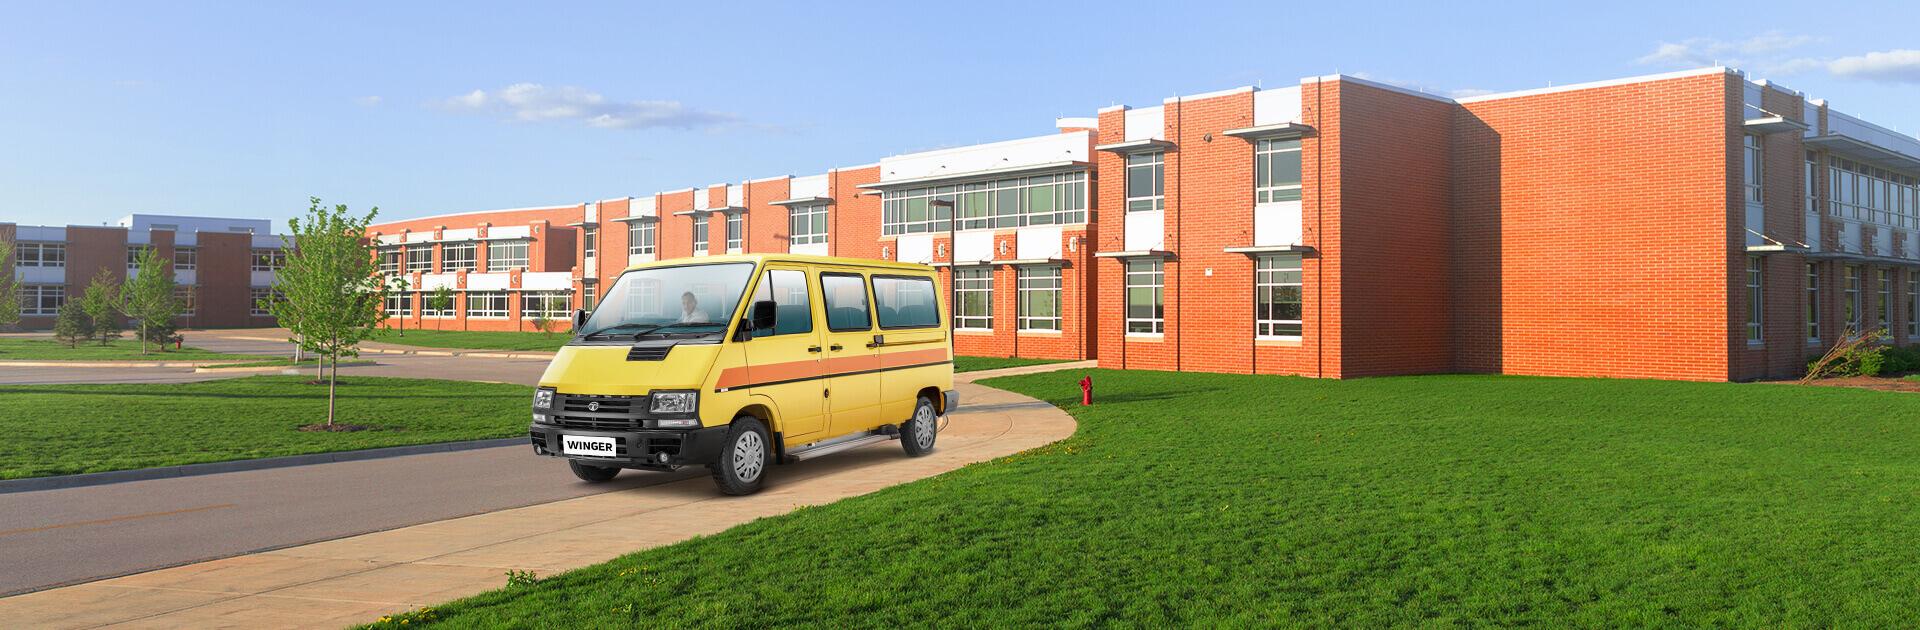 Tata Winger School